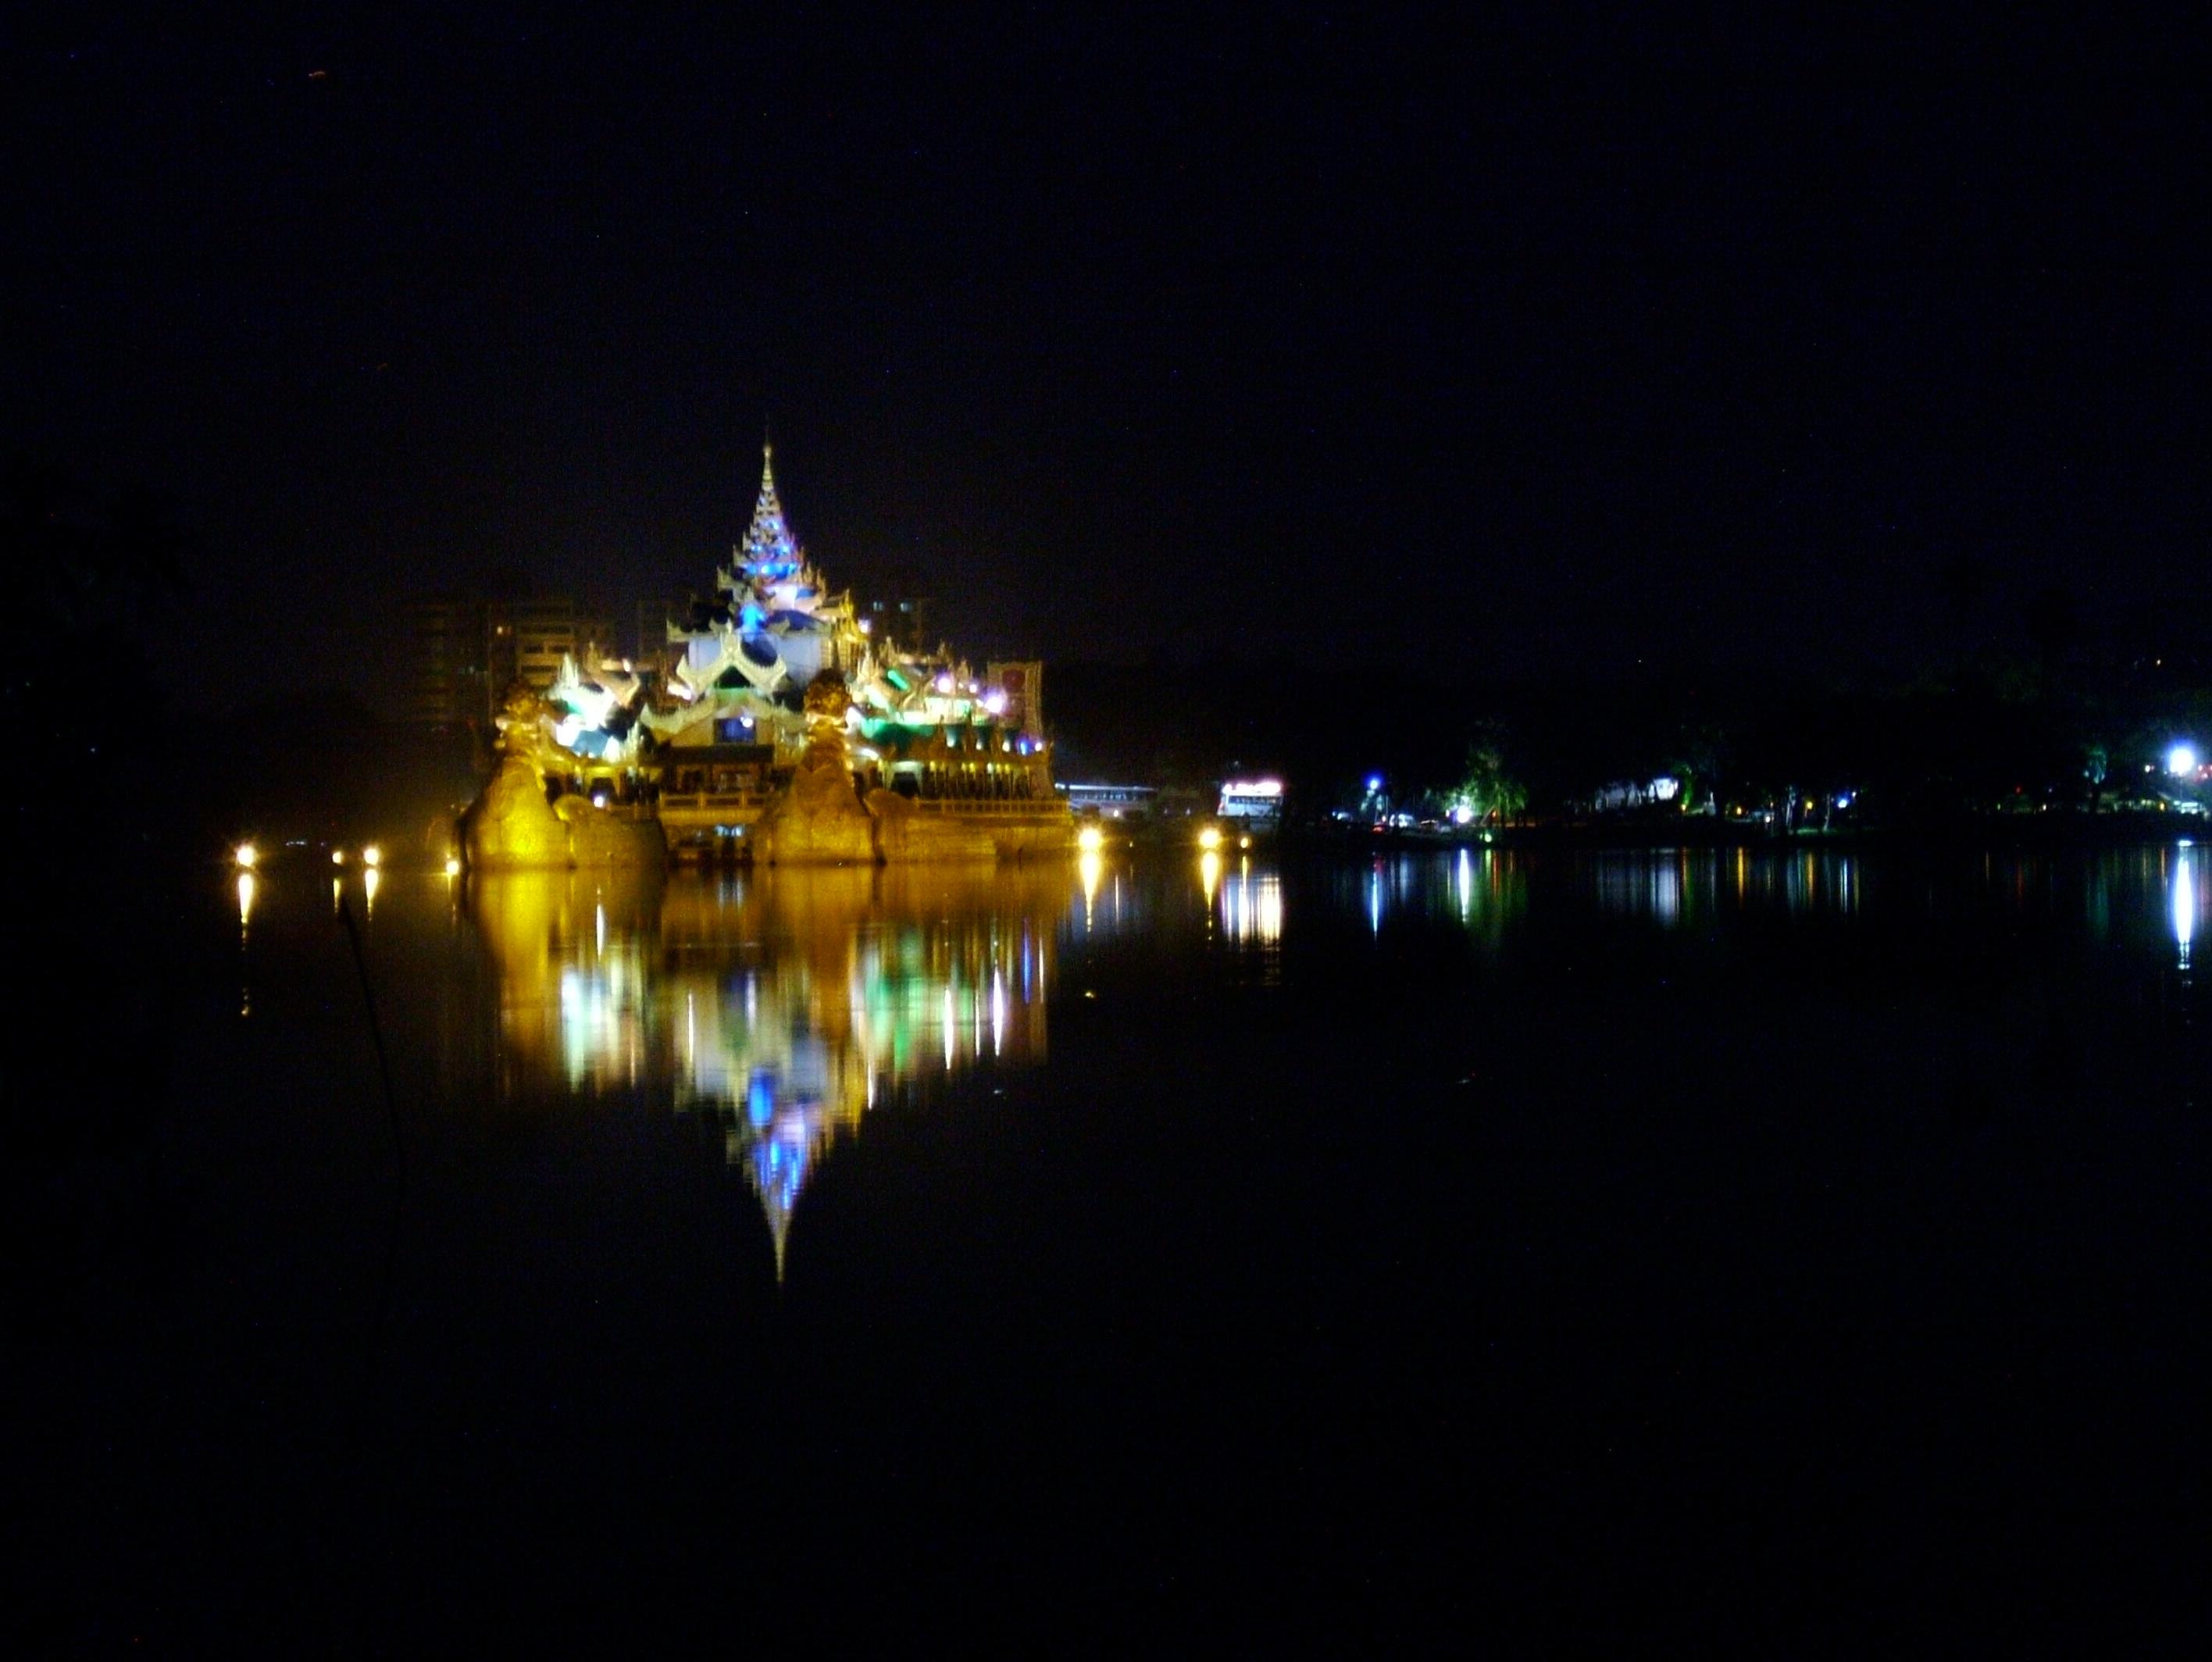 Myanmar Yangon Kandawgyi Palace Hotel royal barge Nov 2004 16